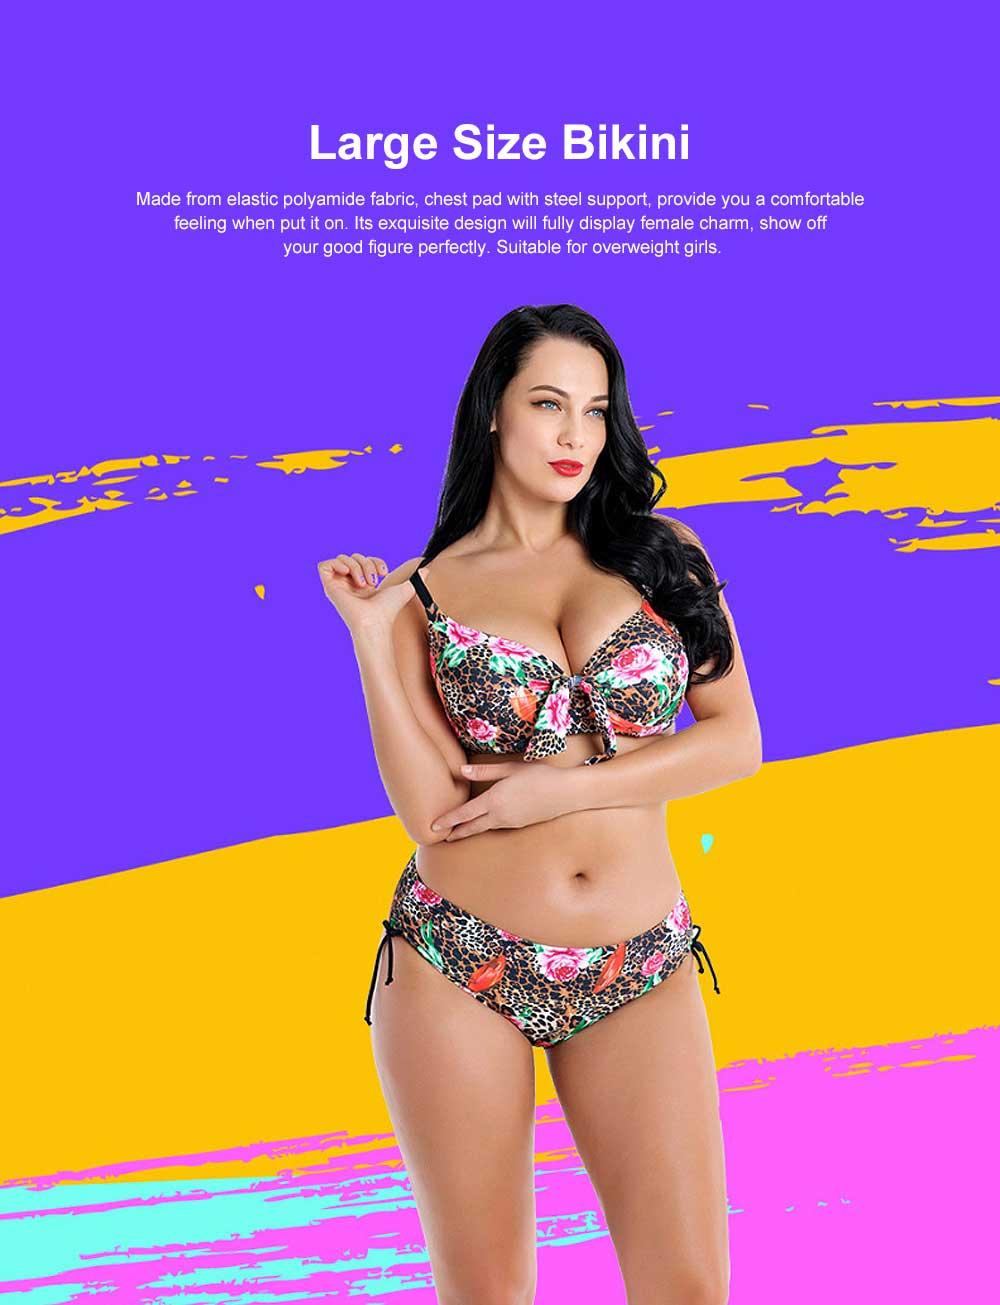 2019 Women's Plus Size Tankini Falsies Bikini with Steel Bracket, Fashion Printed Sexy Bikini, Large Size Two Pieces Swimsuit for Girls 0